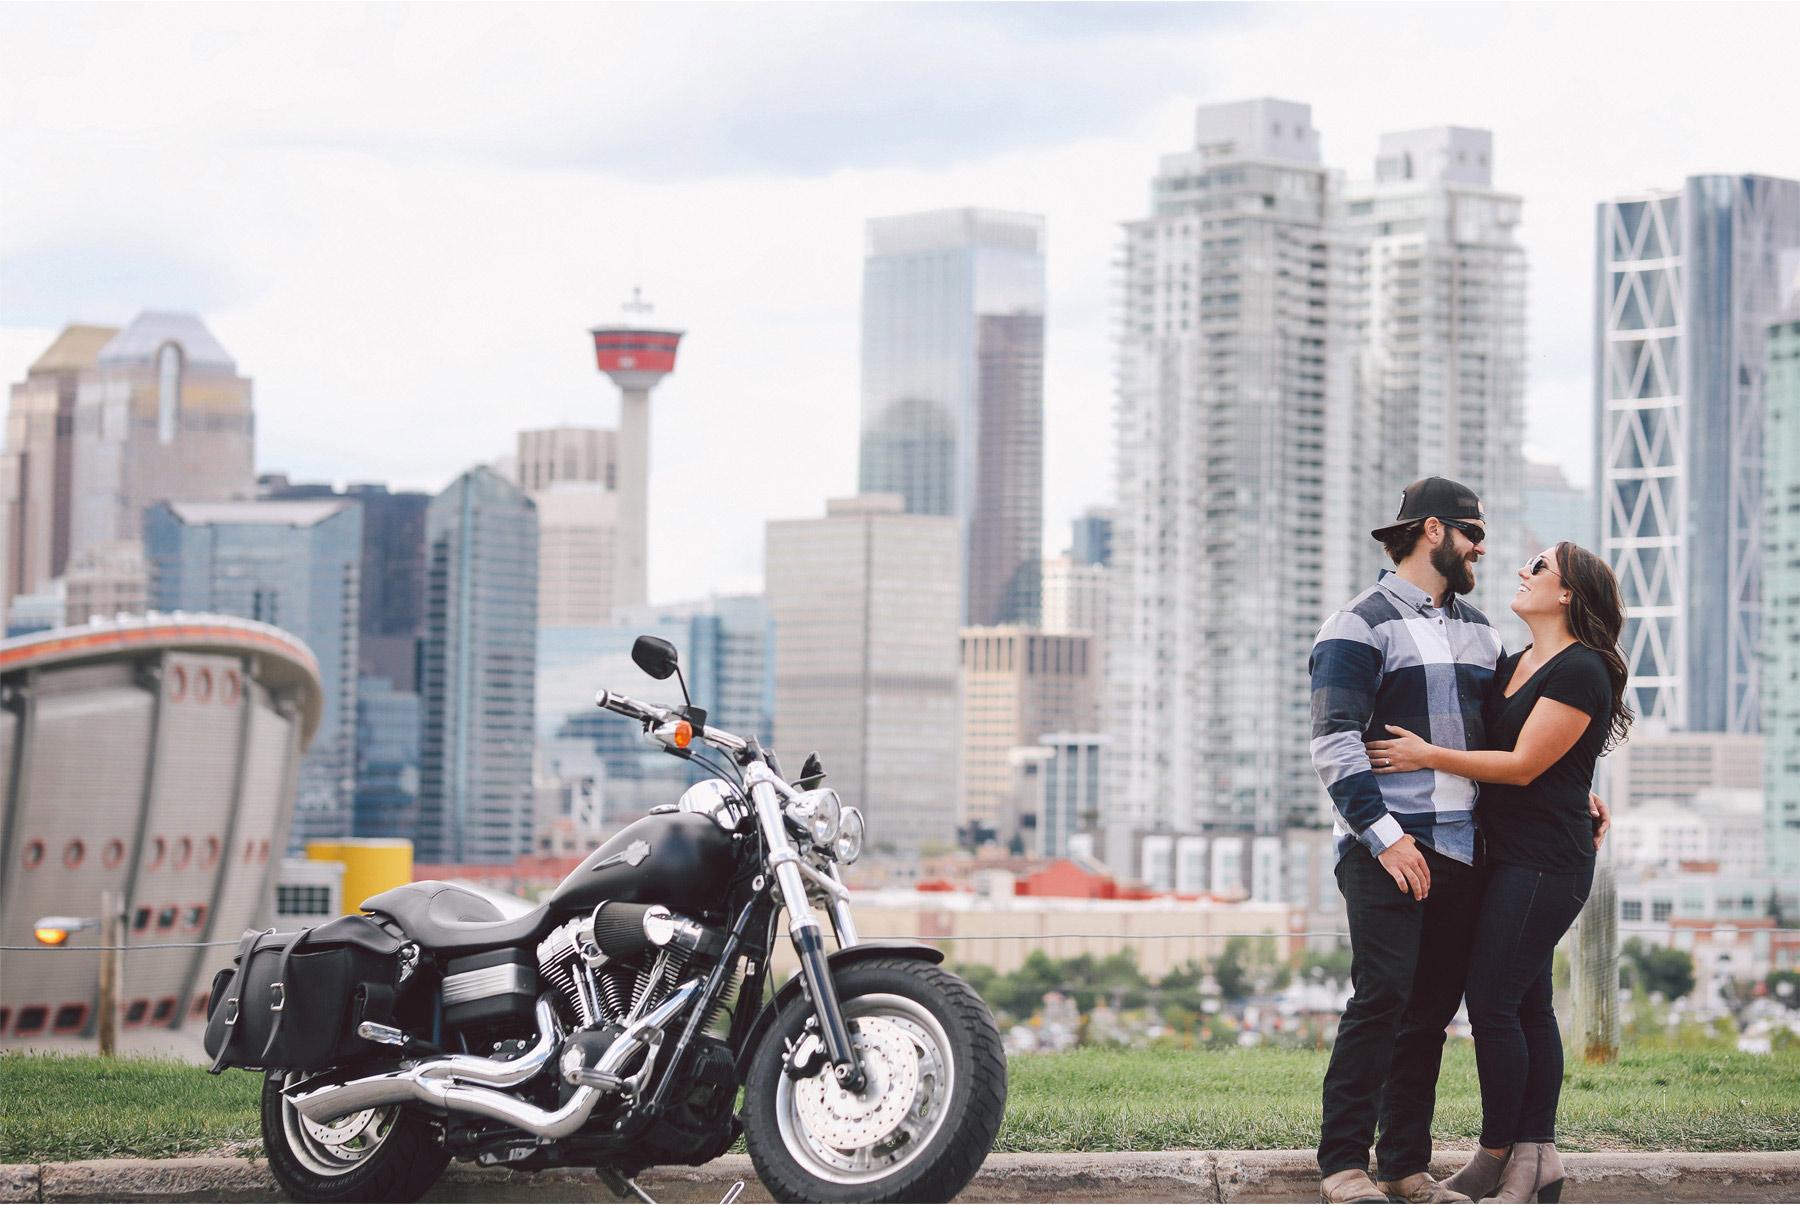 09-Calgary-Canada-Engagement-Photography-by-Vick-Photography-Bikers-Harley-Davidson-Skyline-Lizz-and-Brady.jpg